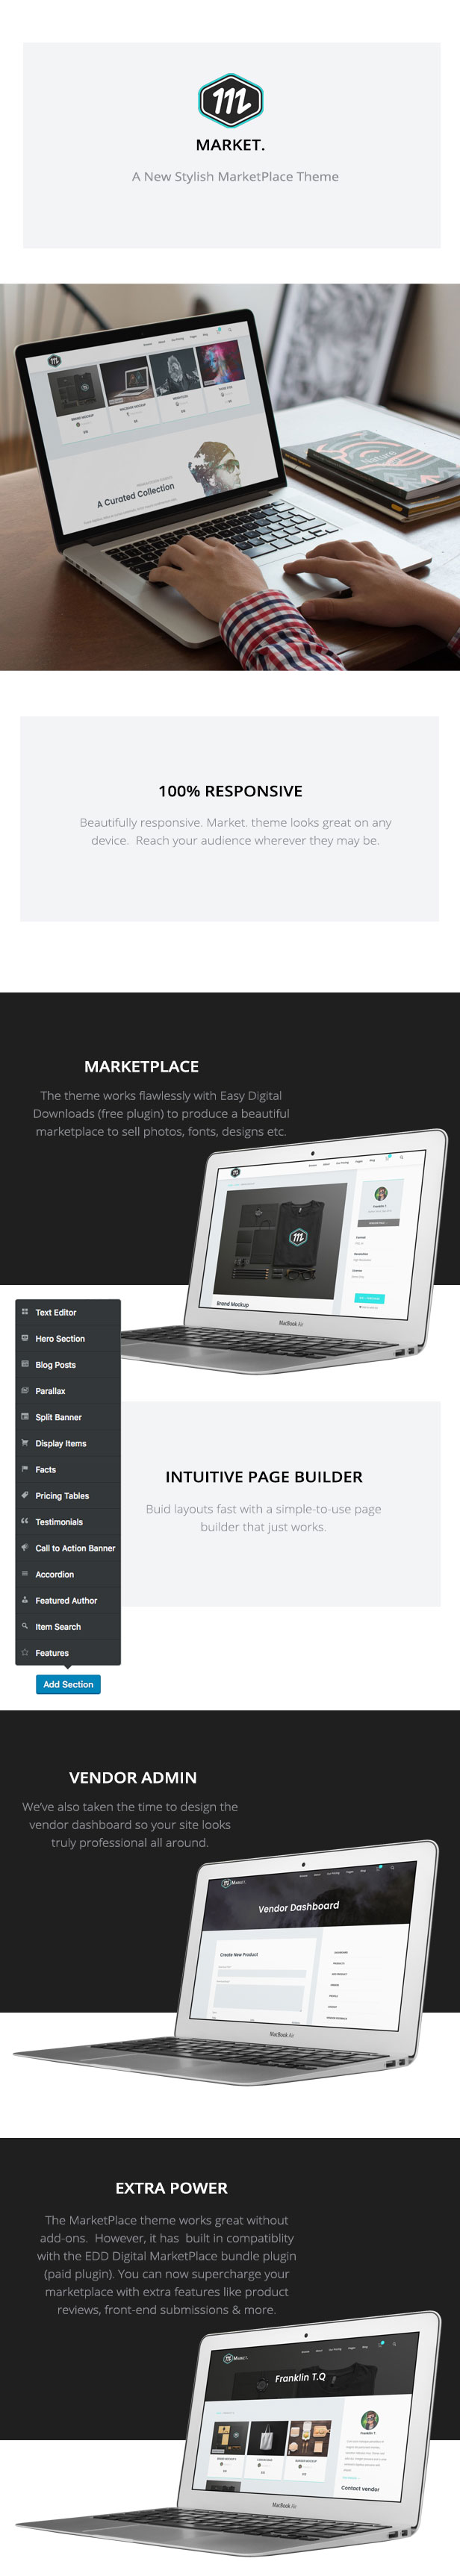 Market - Marketplace WordPress Theme - 1